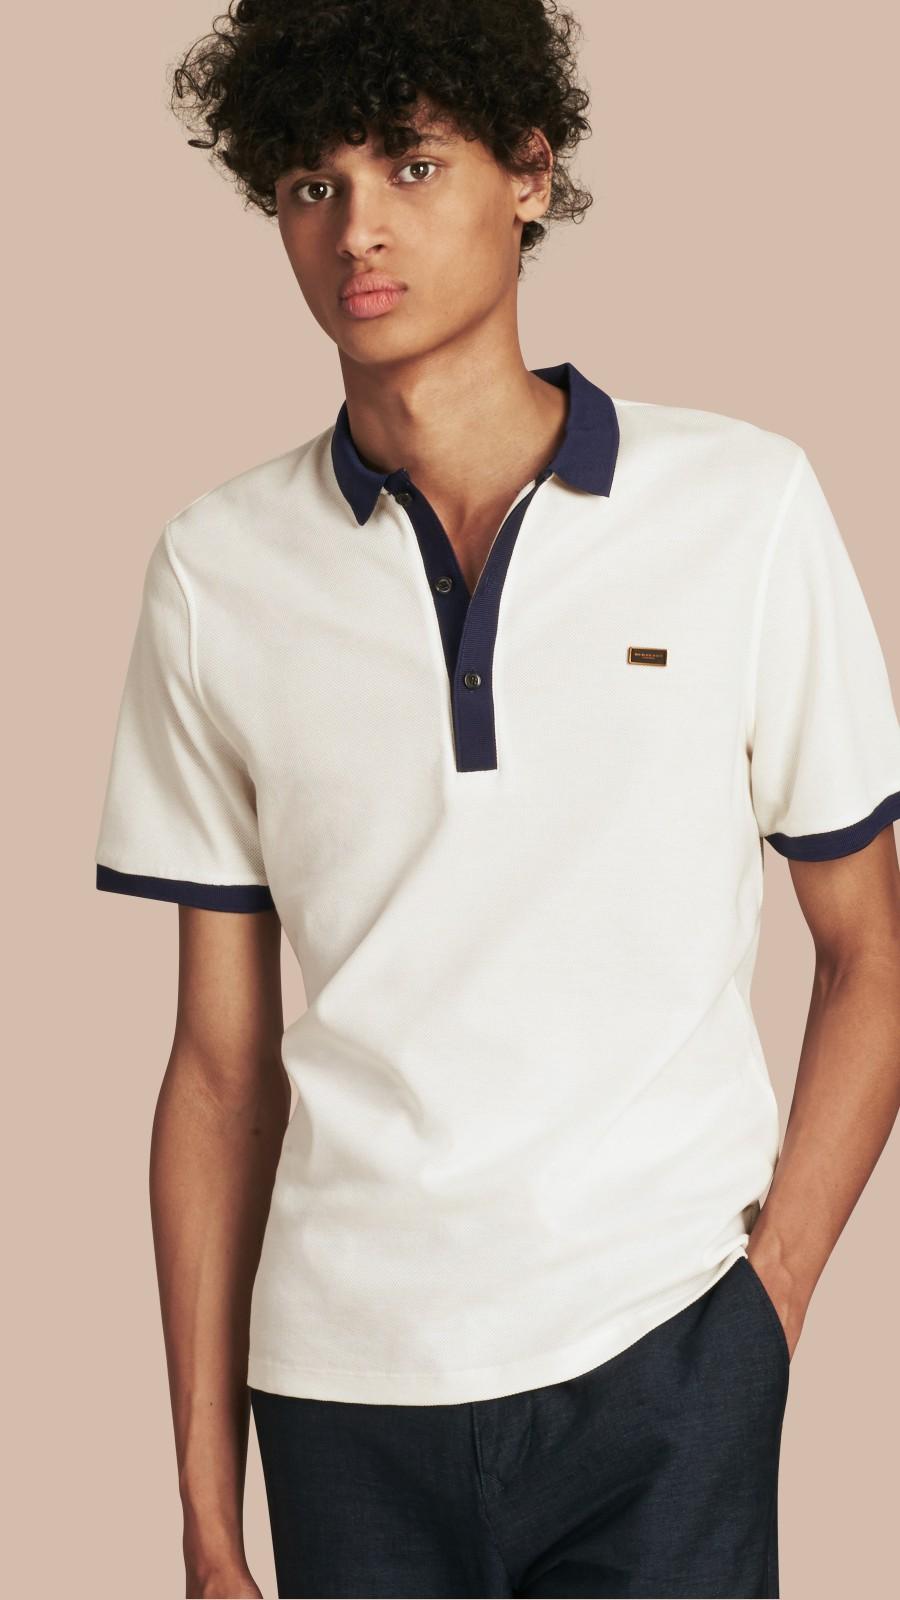 White/navy Mercerised Cotton Polo Shirt White/navy - Image 1